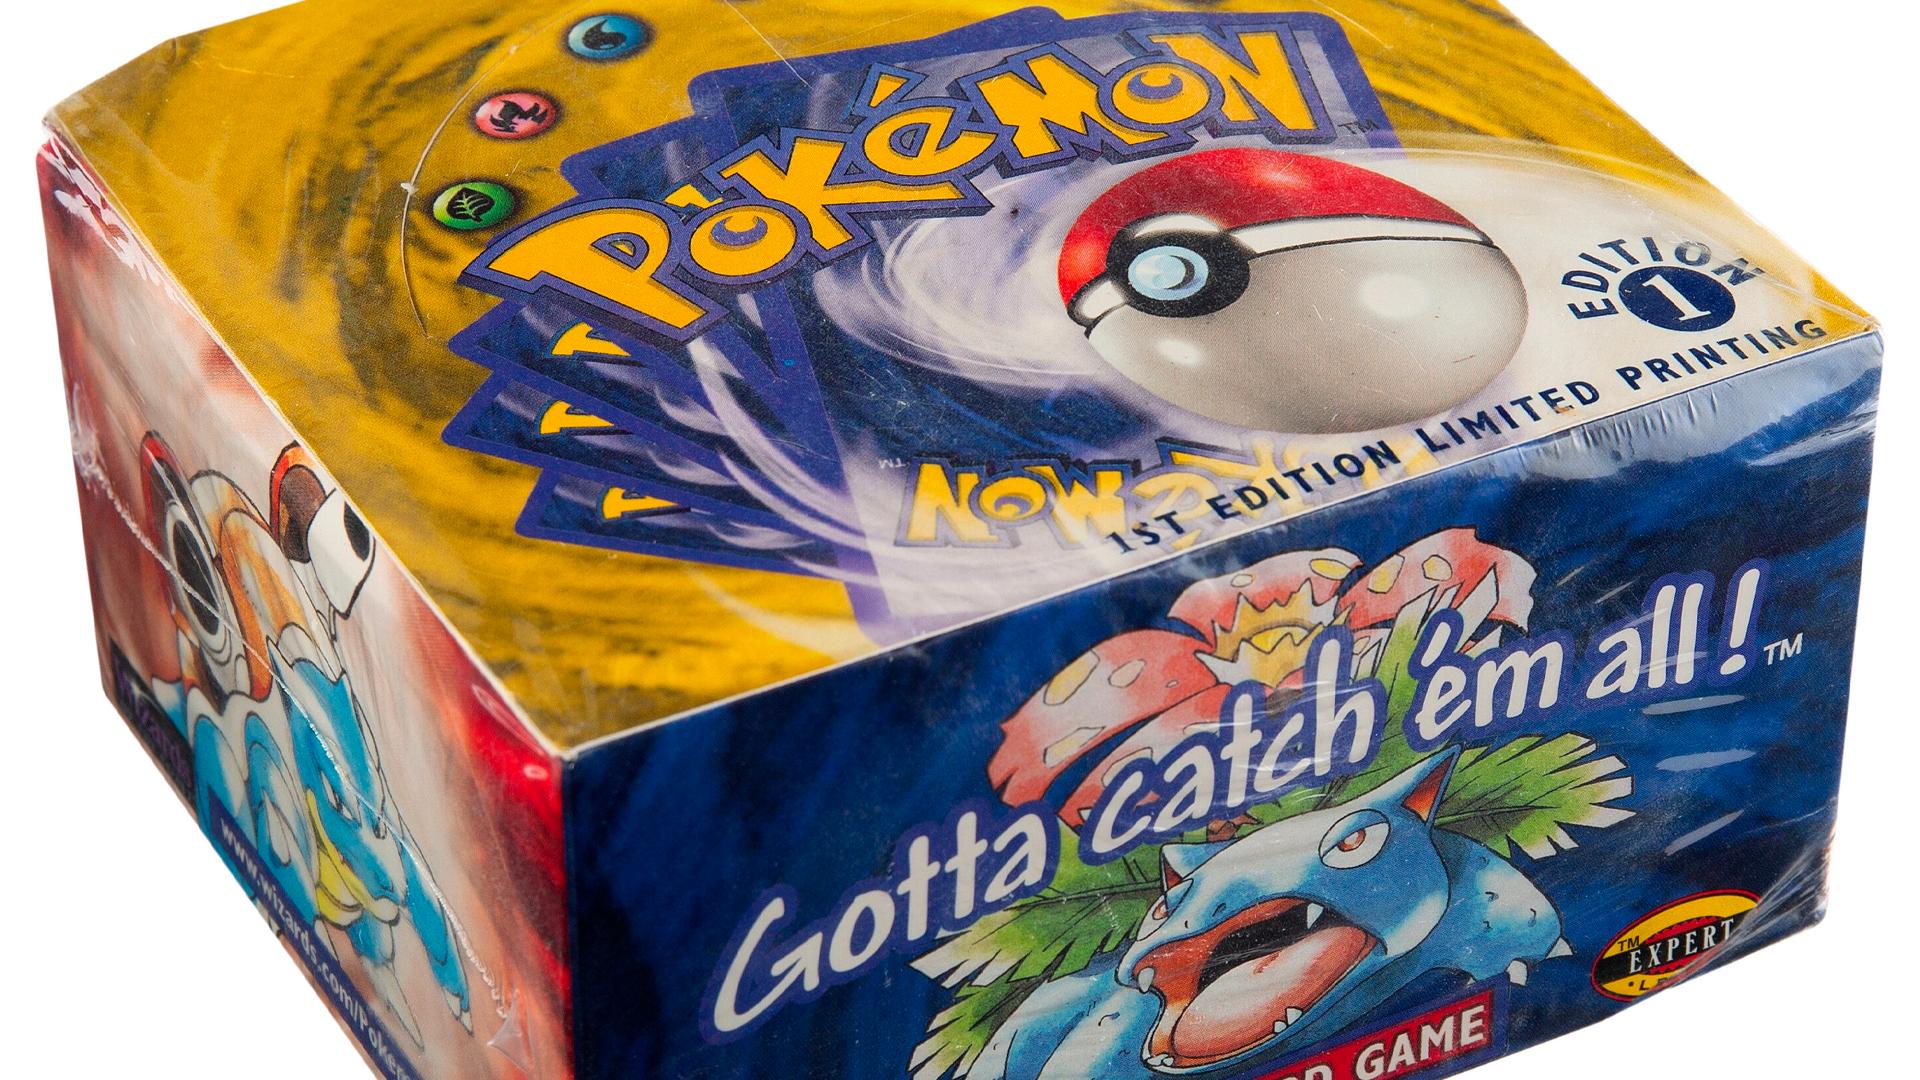 Sealed first-edition Pokemon TCG Base Set booster box